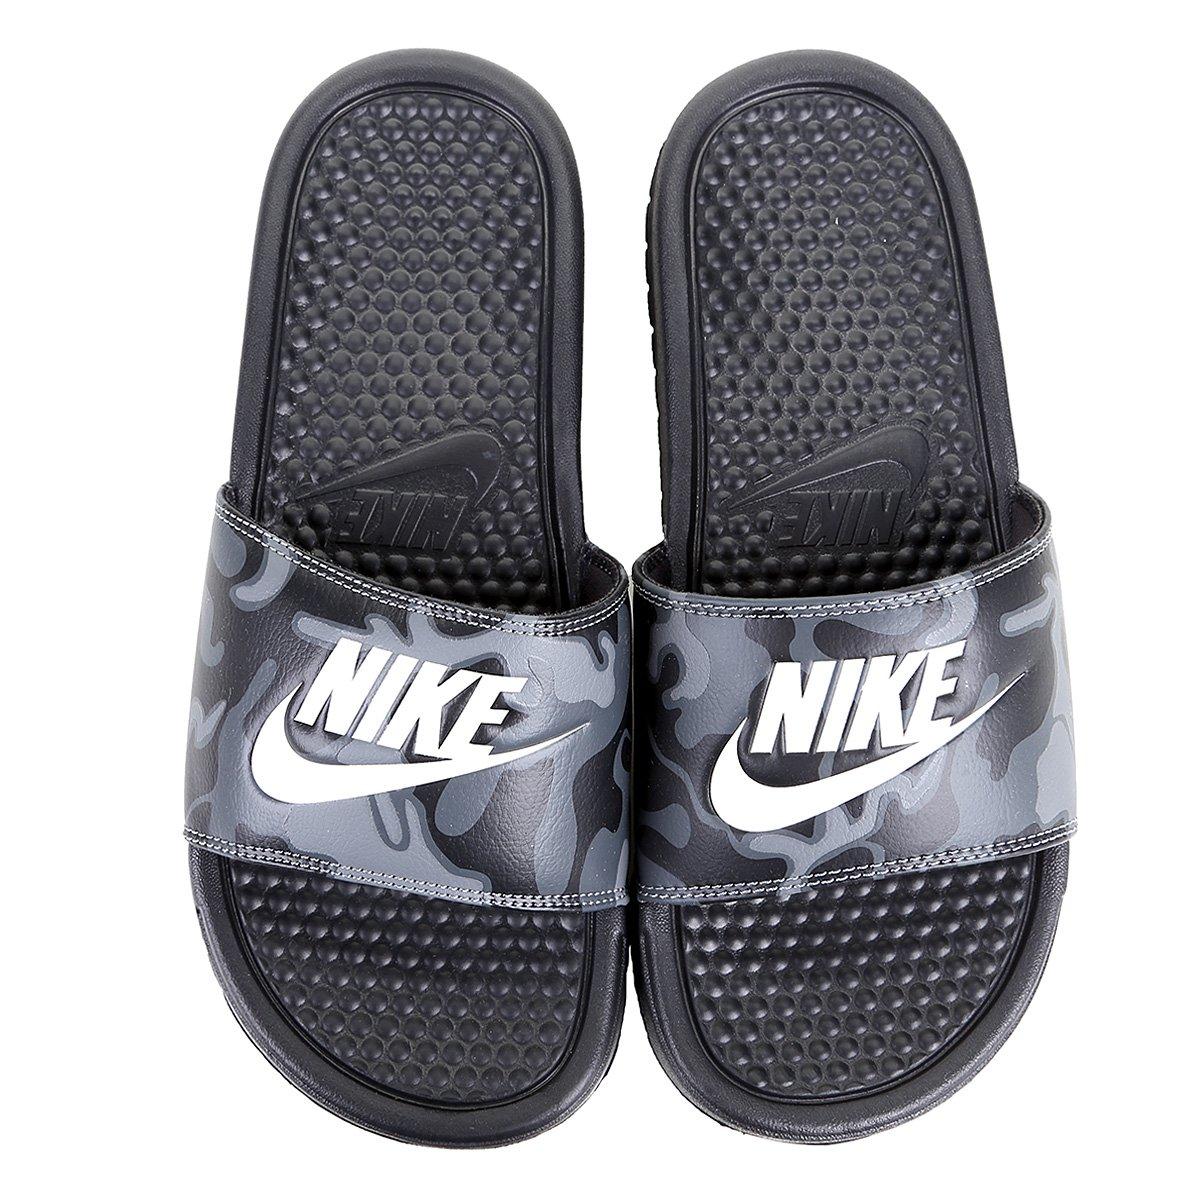 34f78315d52e5 Chinelo Nike Benassi Jdi Print Masculino - Branco e Preto | Shop Timão